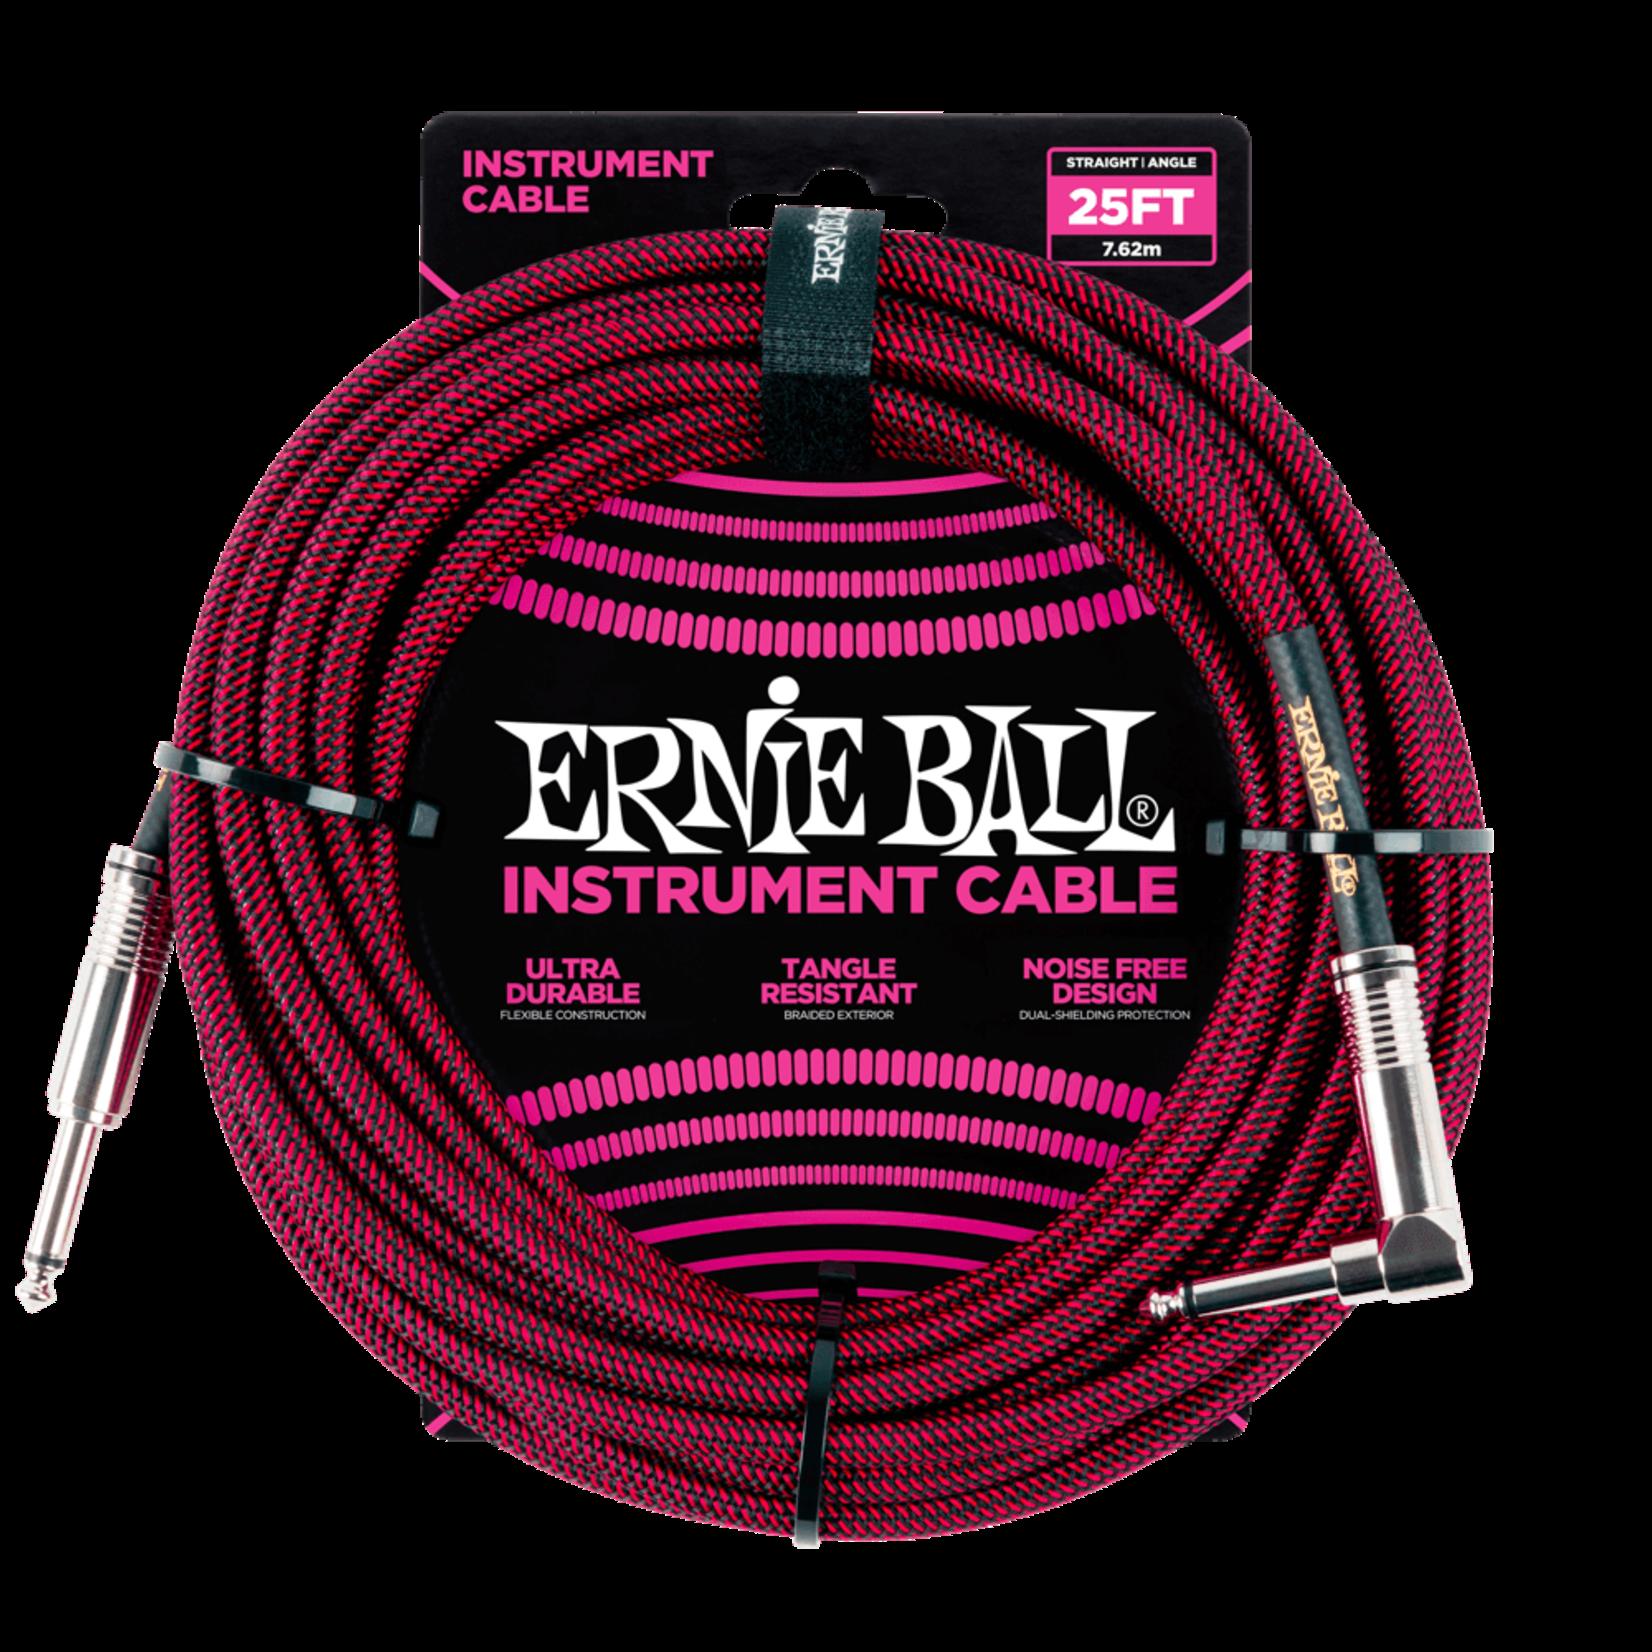 ERNIE BALL 6062EB 25' STRGHT/ANGLE RED-BLACK